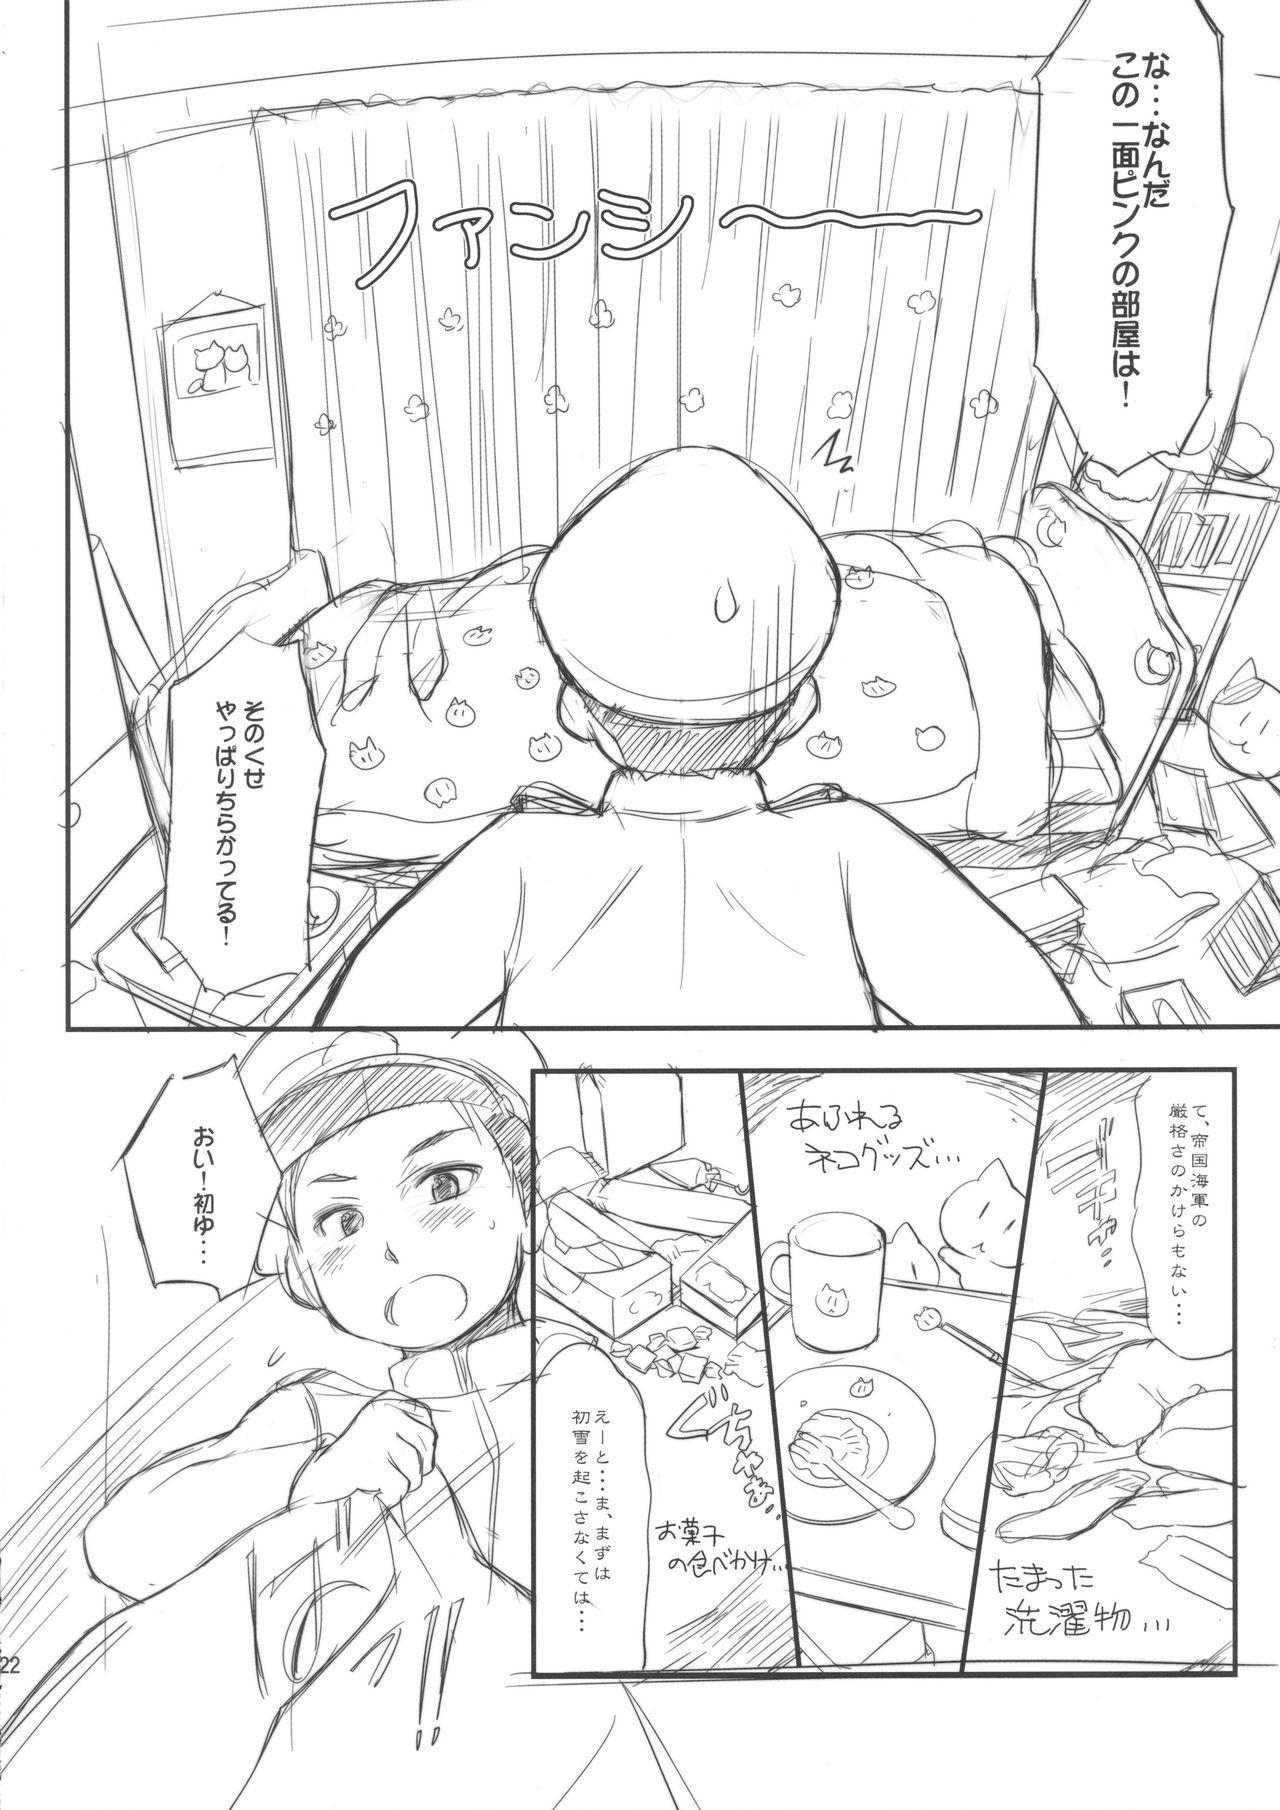 Kuchukukan Hachuyuki Monogatari 21